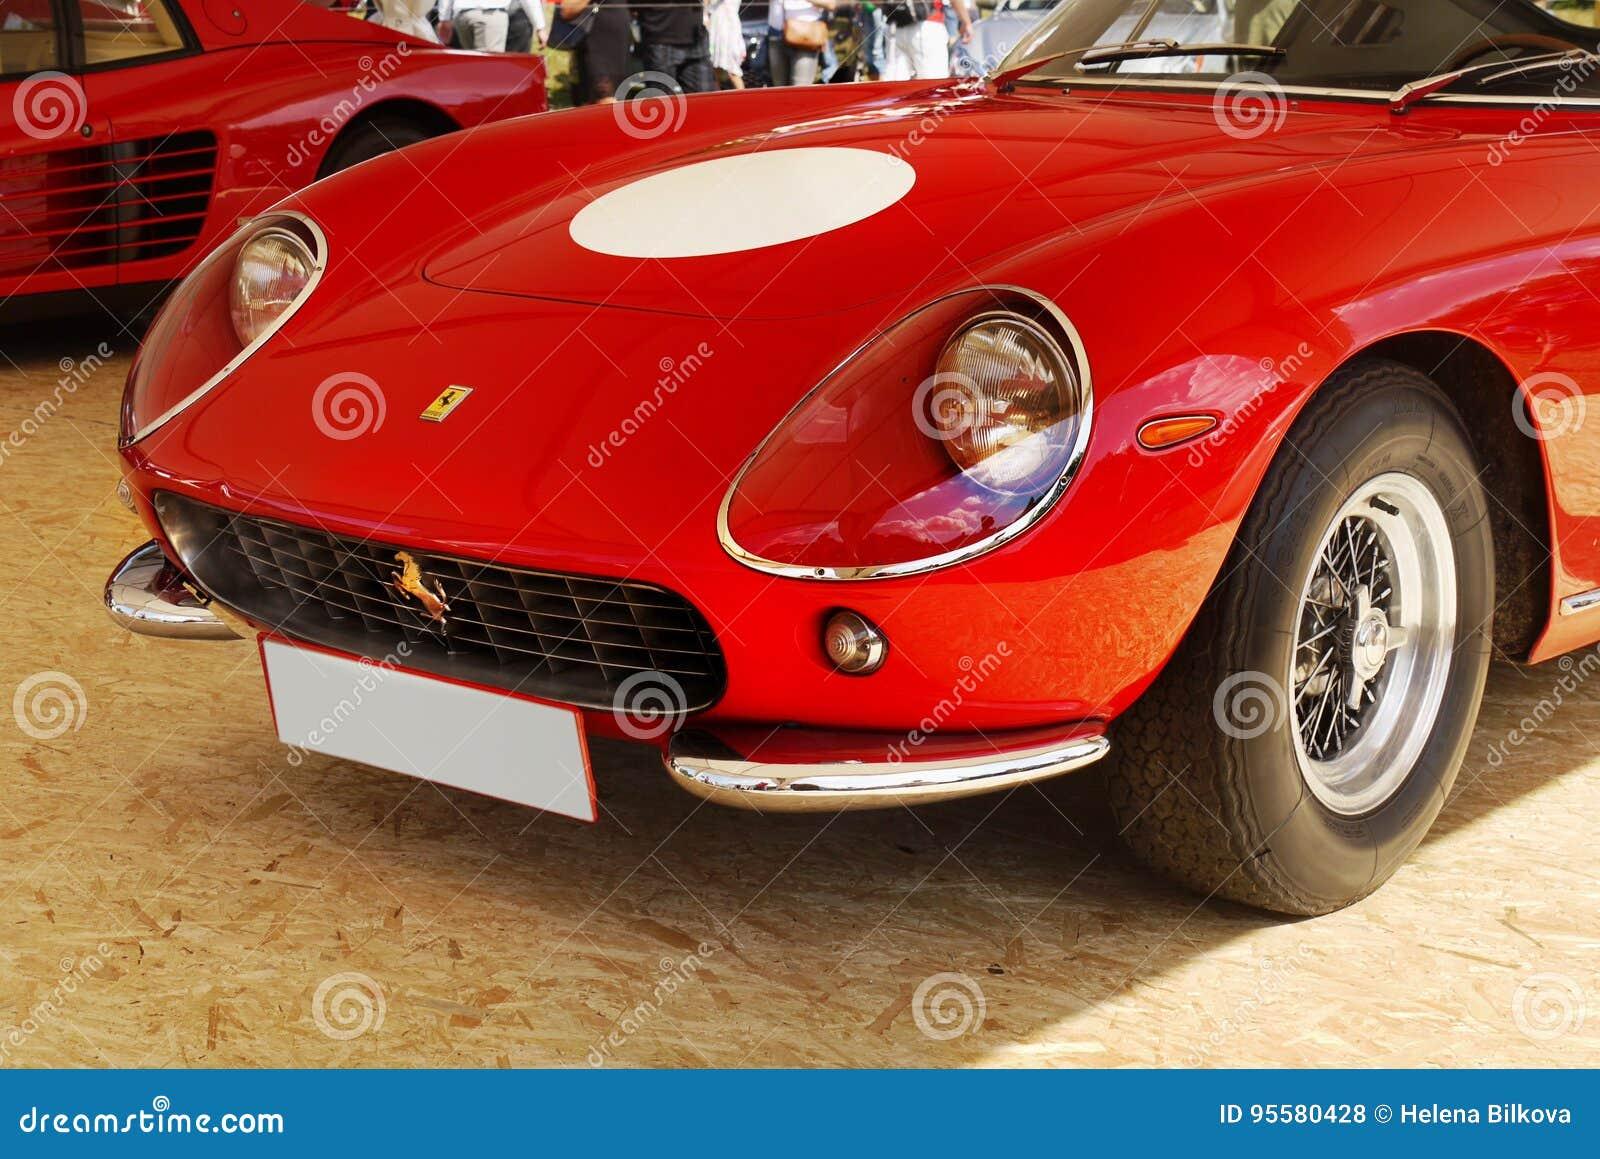 Vintage Ferrari Que Compete Carros De Esportes Foto De Stock Editorial Imagem De Ferrari Compete 95580428